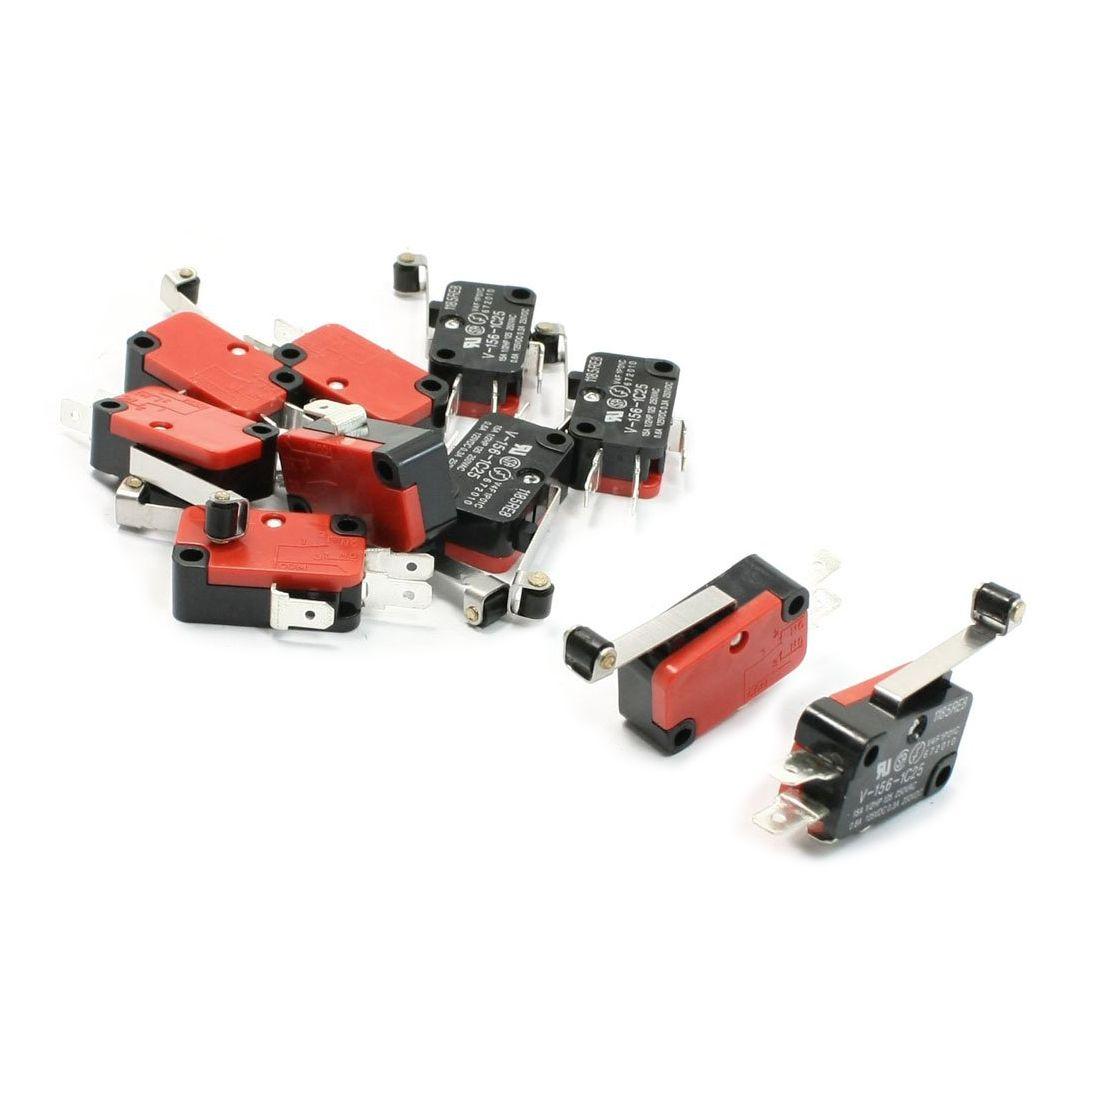 EWS 10 Pcs Micro Limit Switch Long Hinge Roller Lever Arm Snap Action LOT